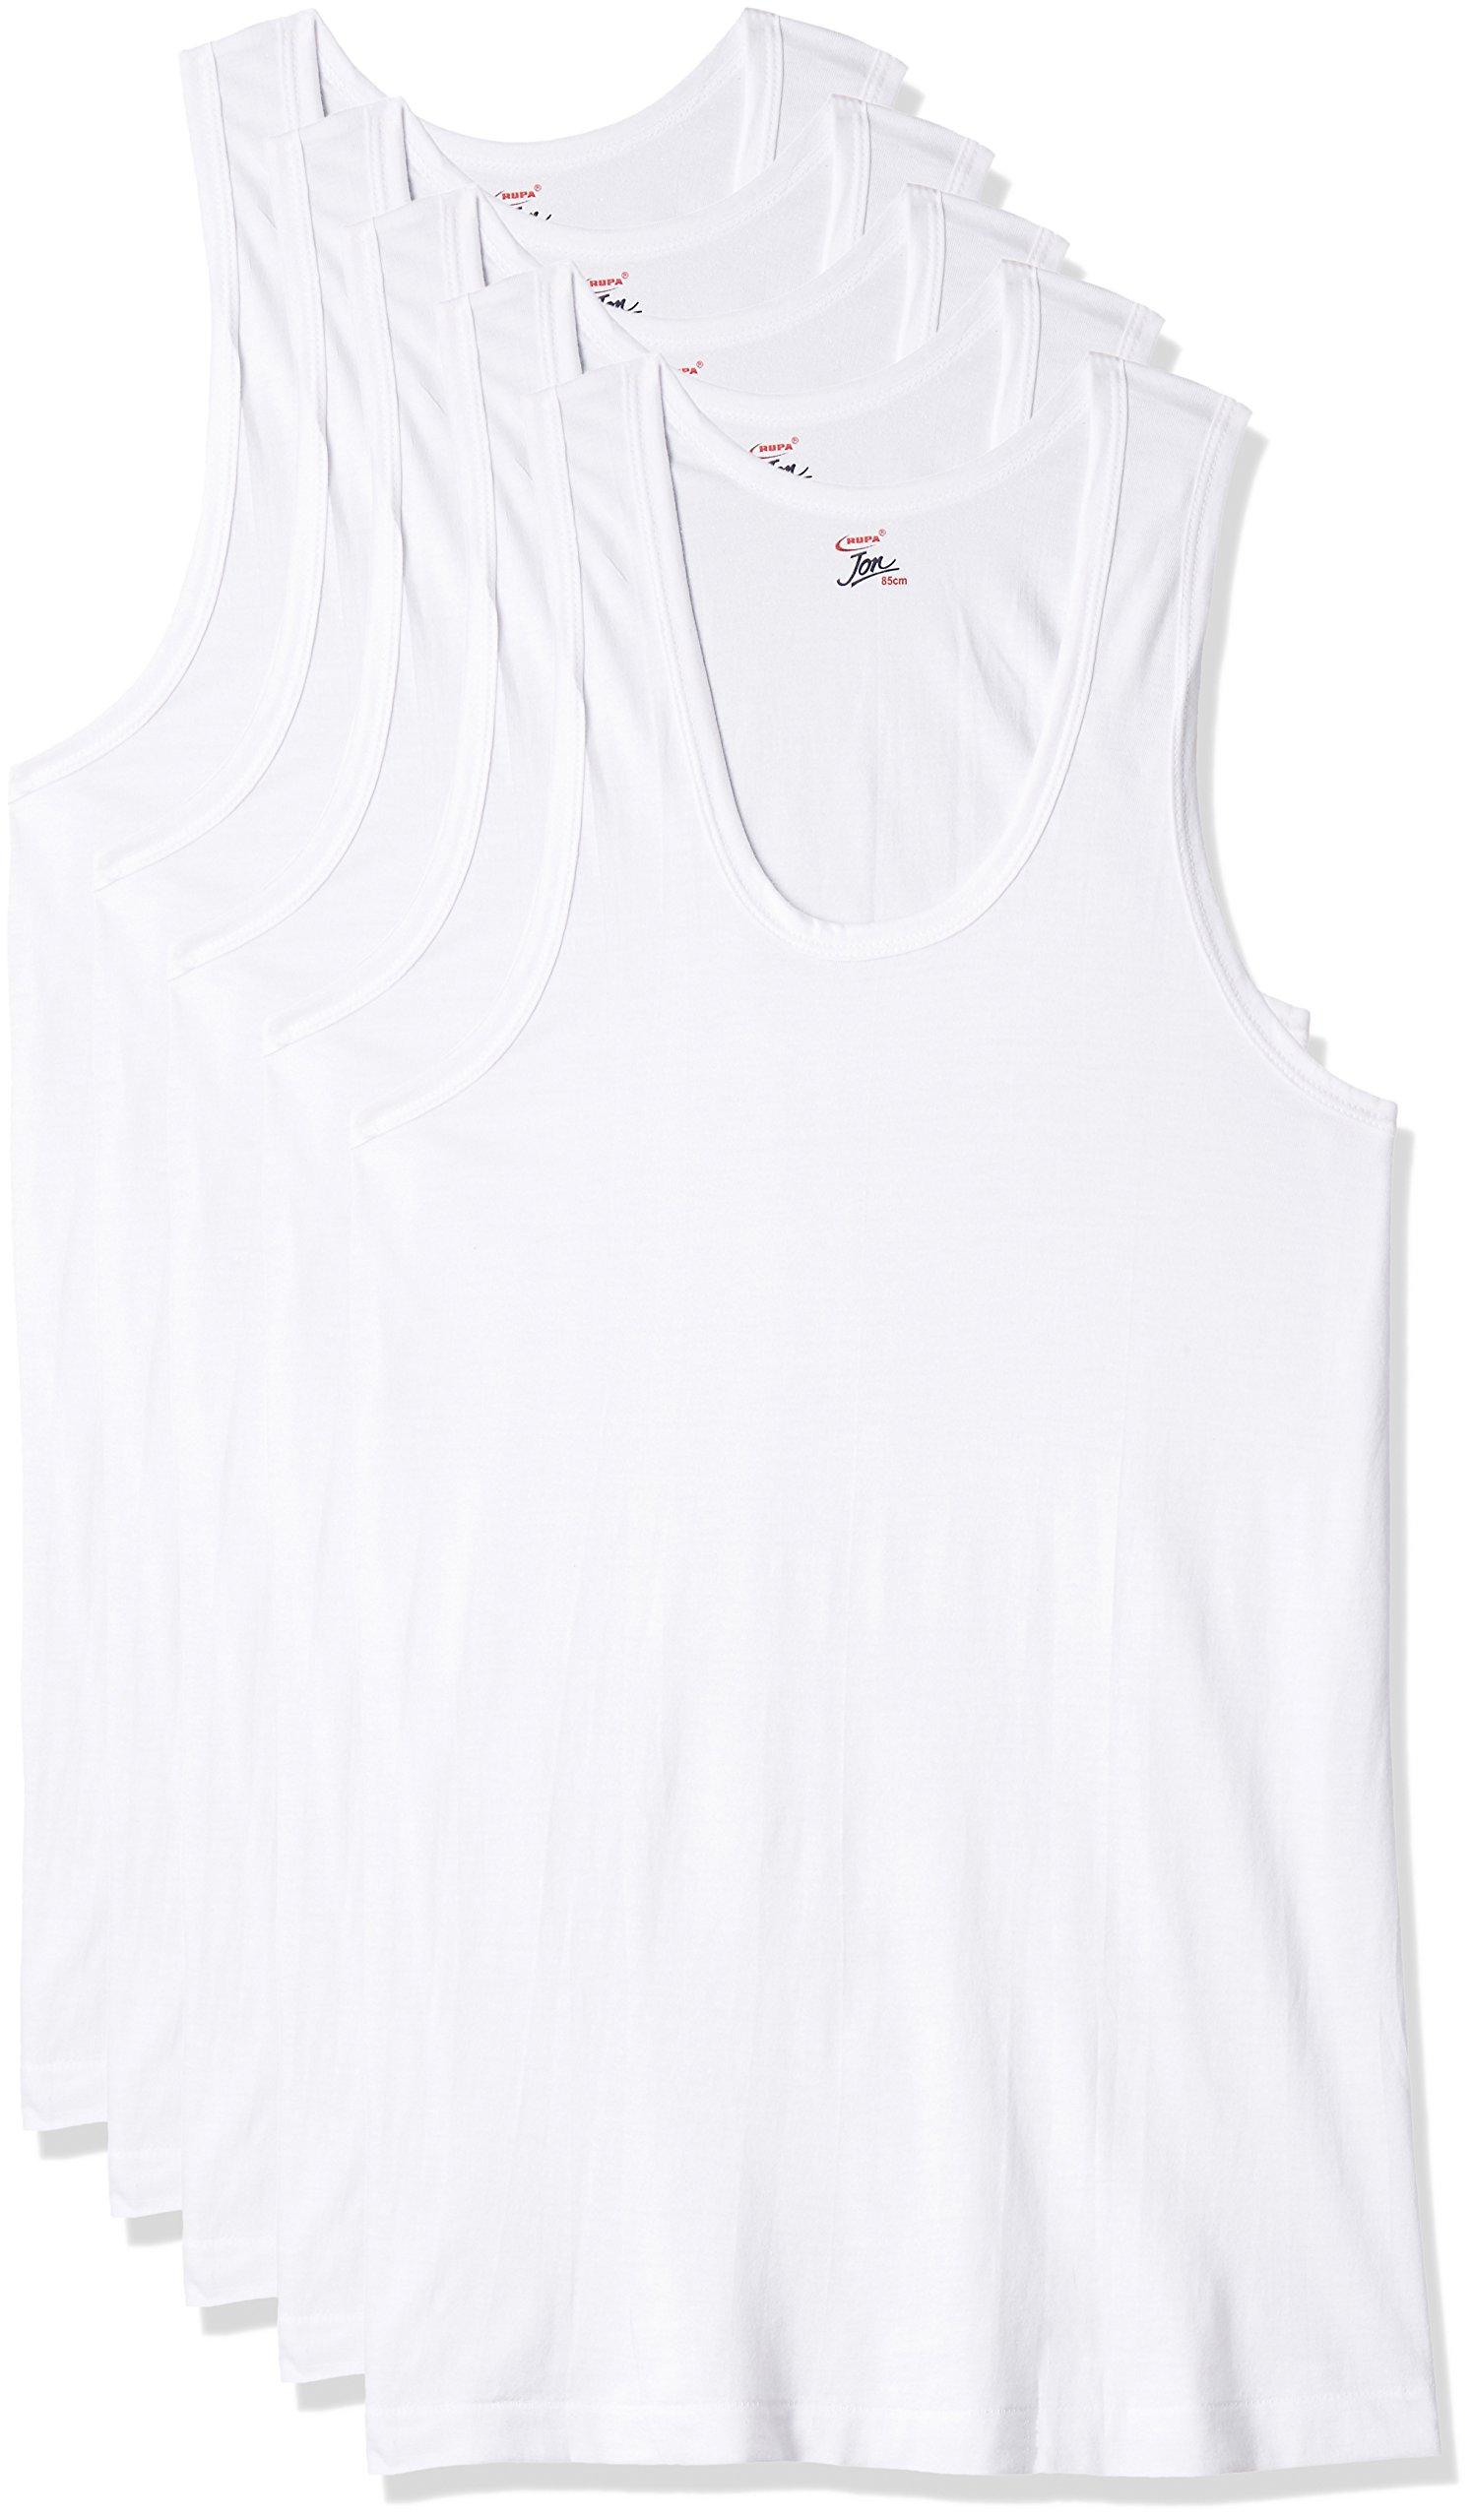 2e705e2470dc Rupa Jon Men's Cotton Vest (Pack of 5) | Buy Bestow